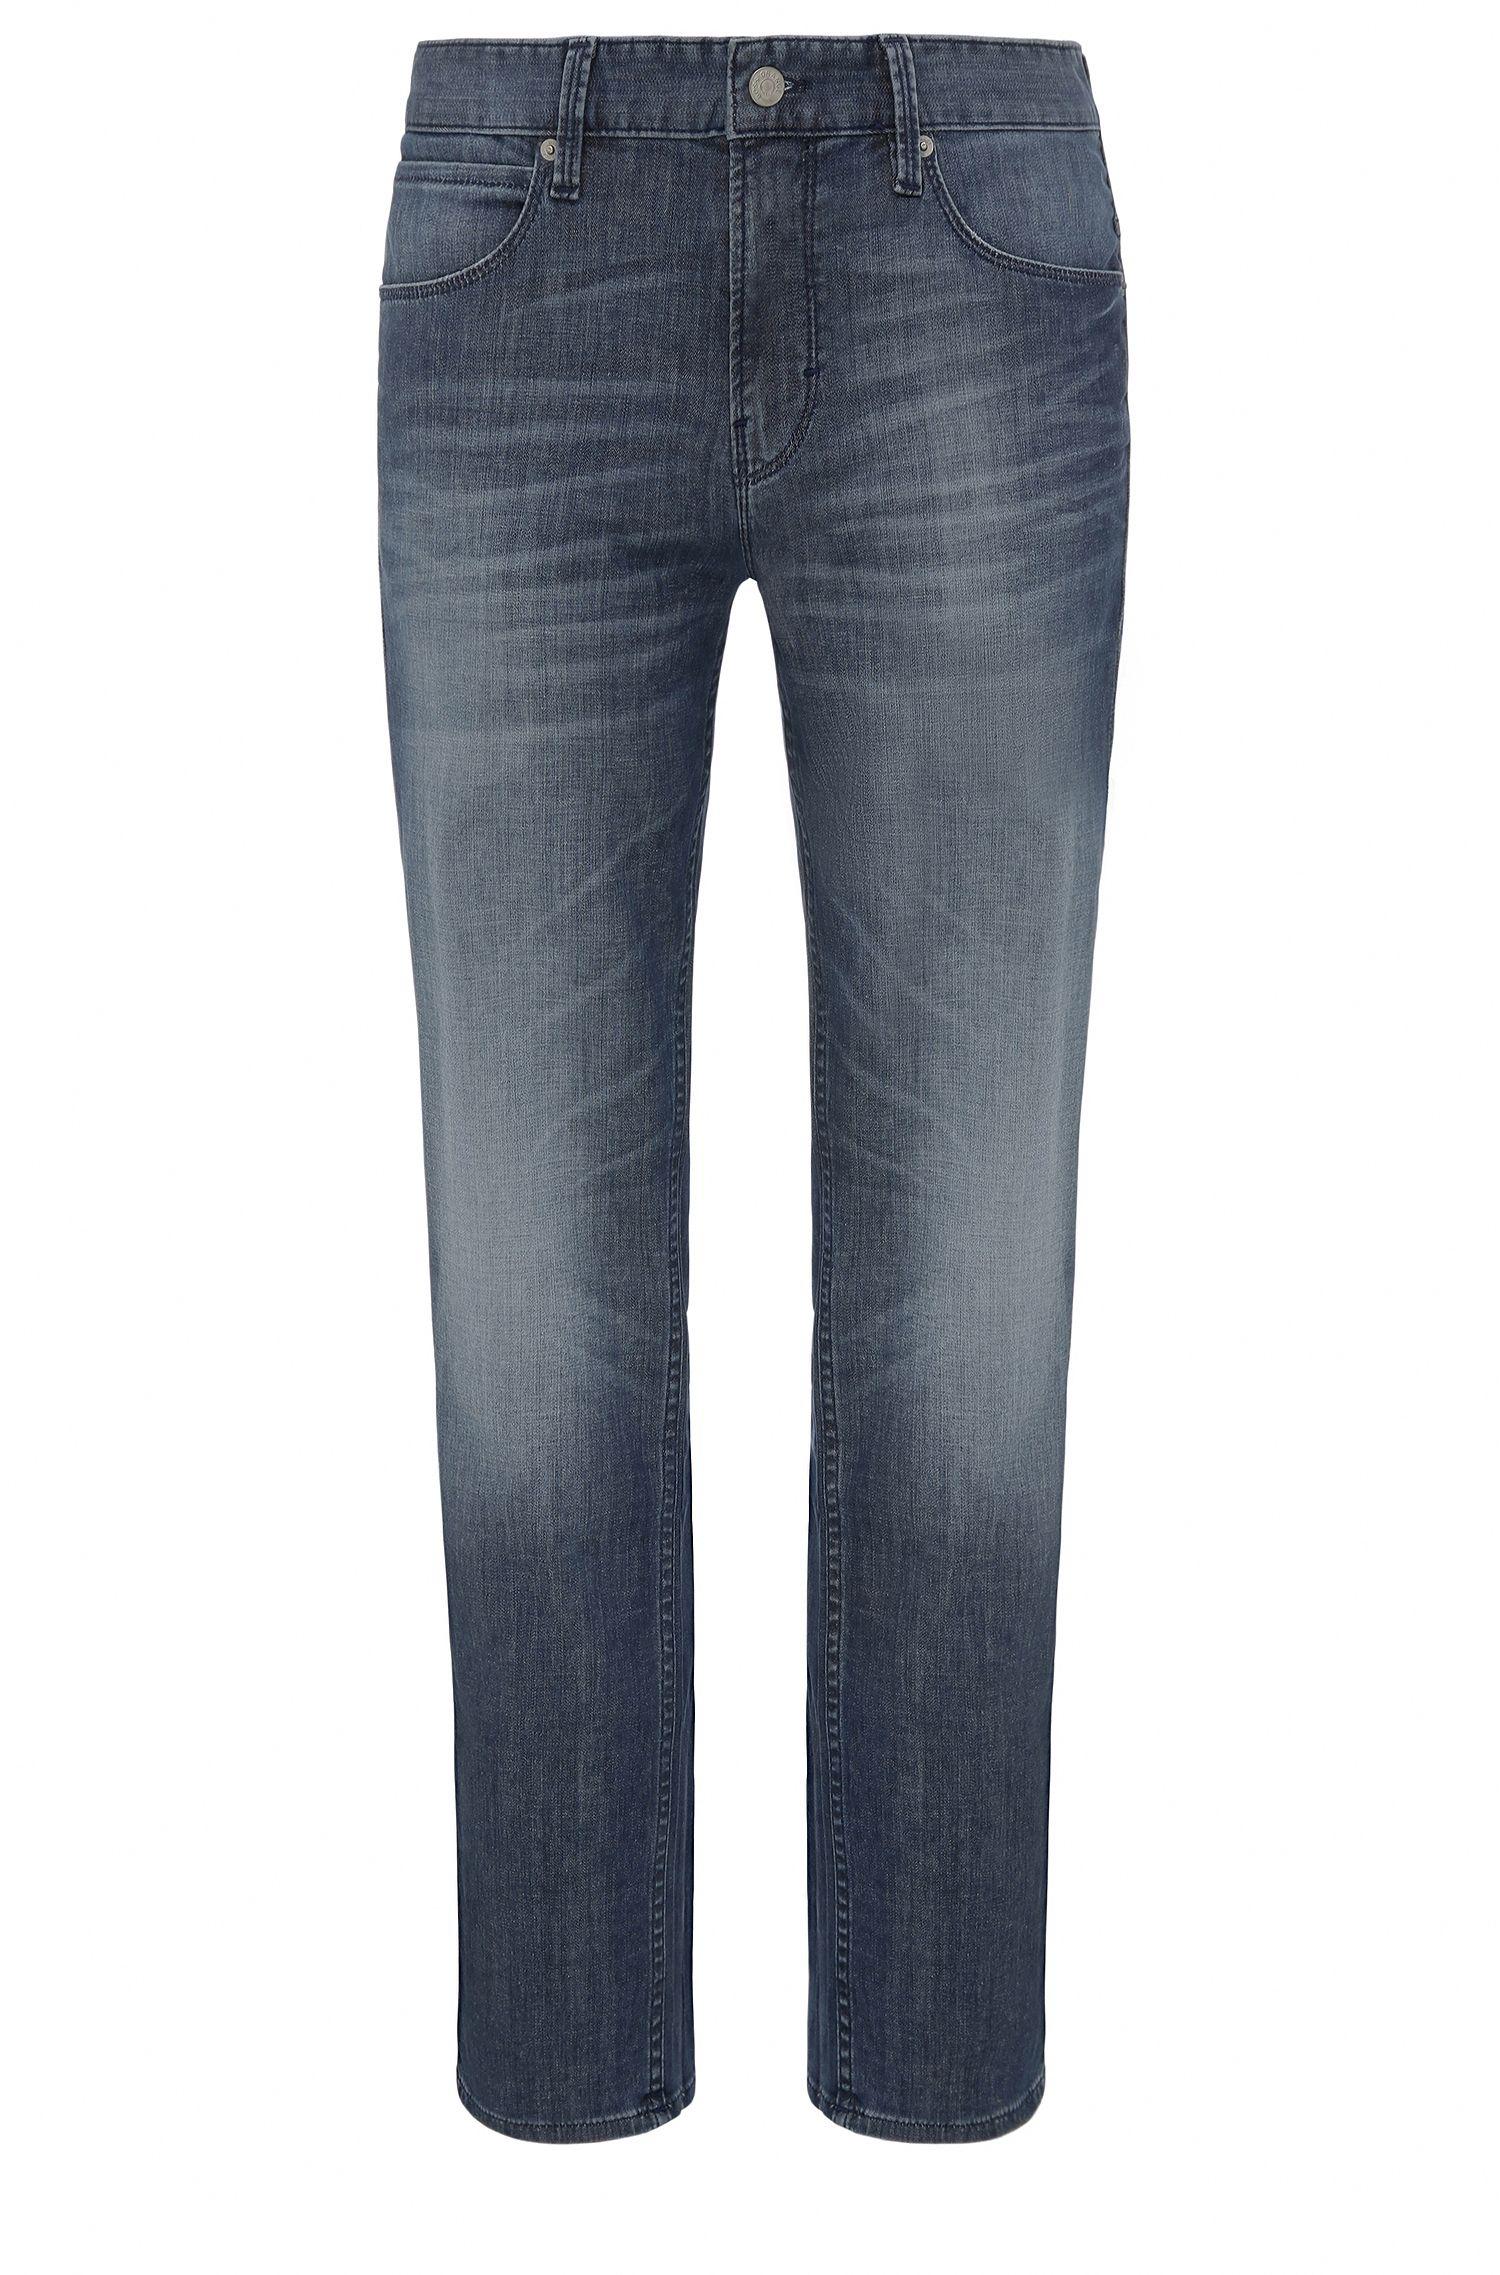 'Orange63' | Slim Fit, 8.25 oz Stretch Cotton Blend Jeans